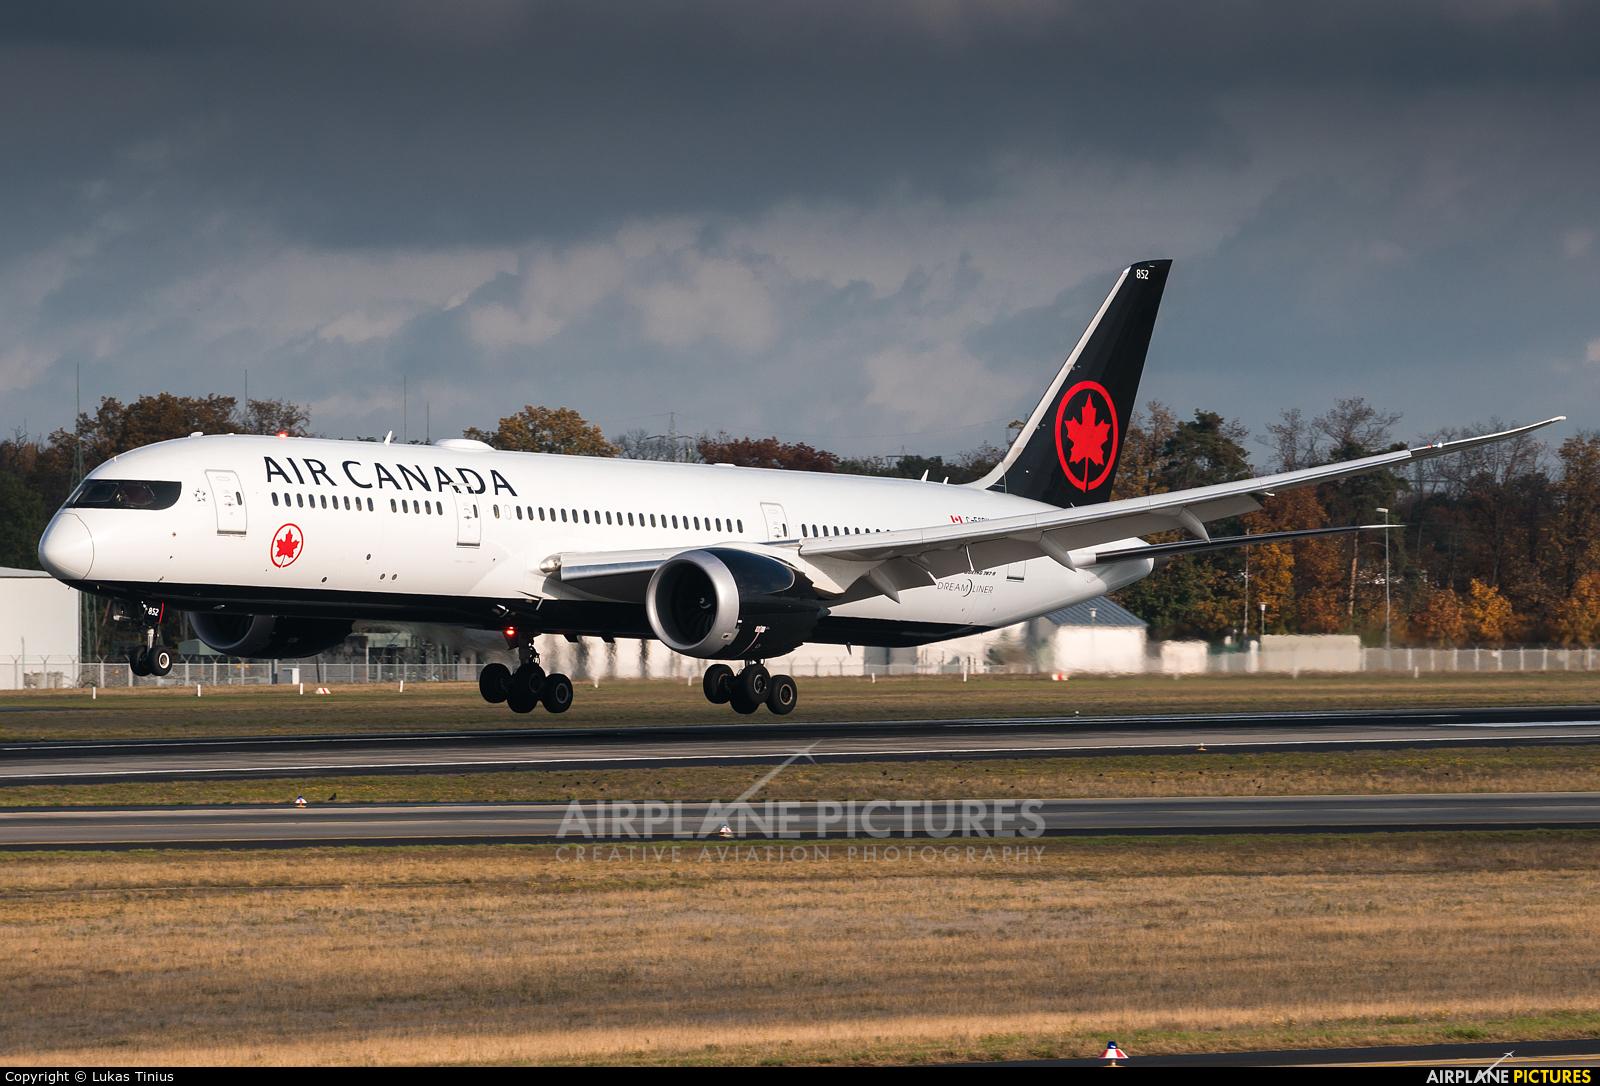 Air Canada C-FSBV aircraft at Frankfurt